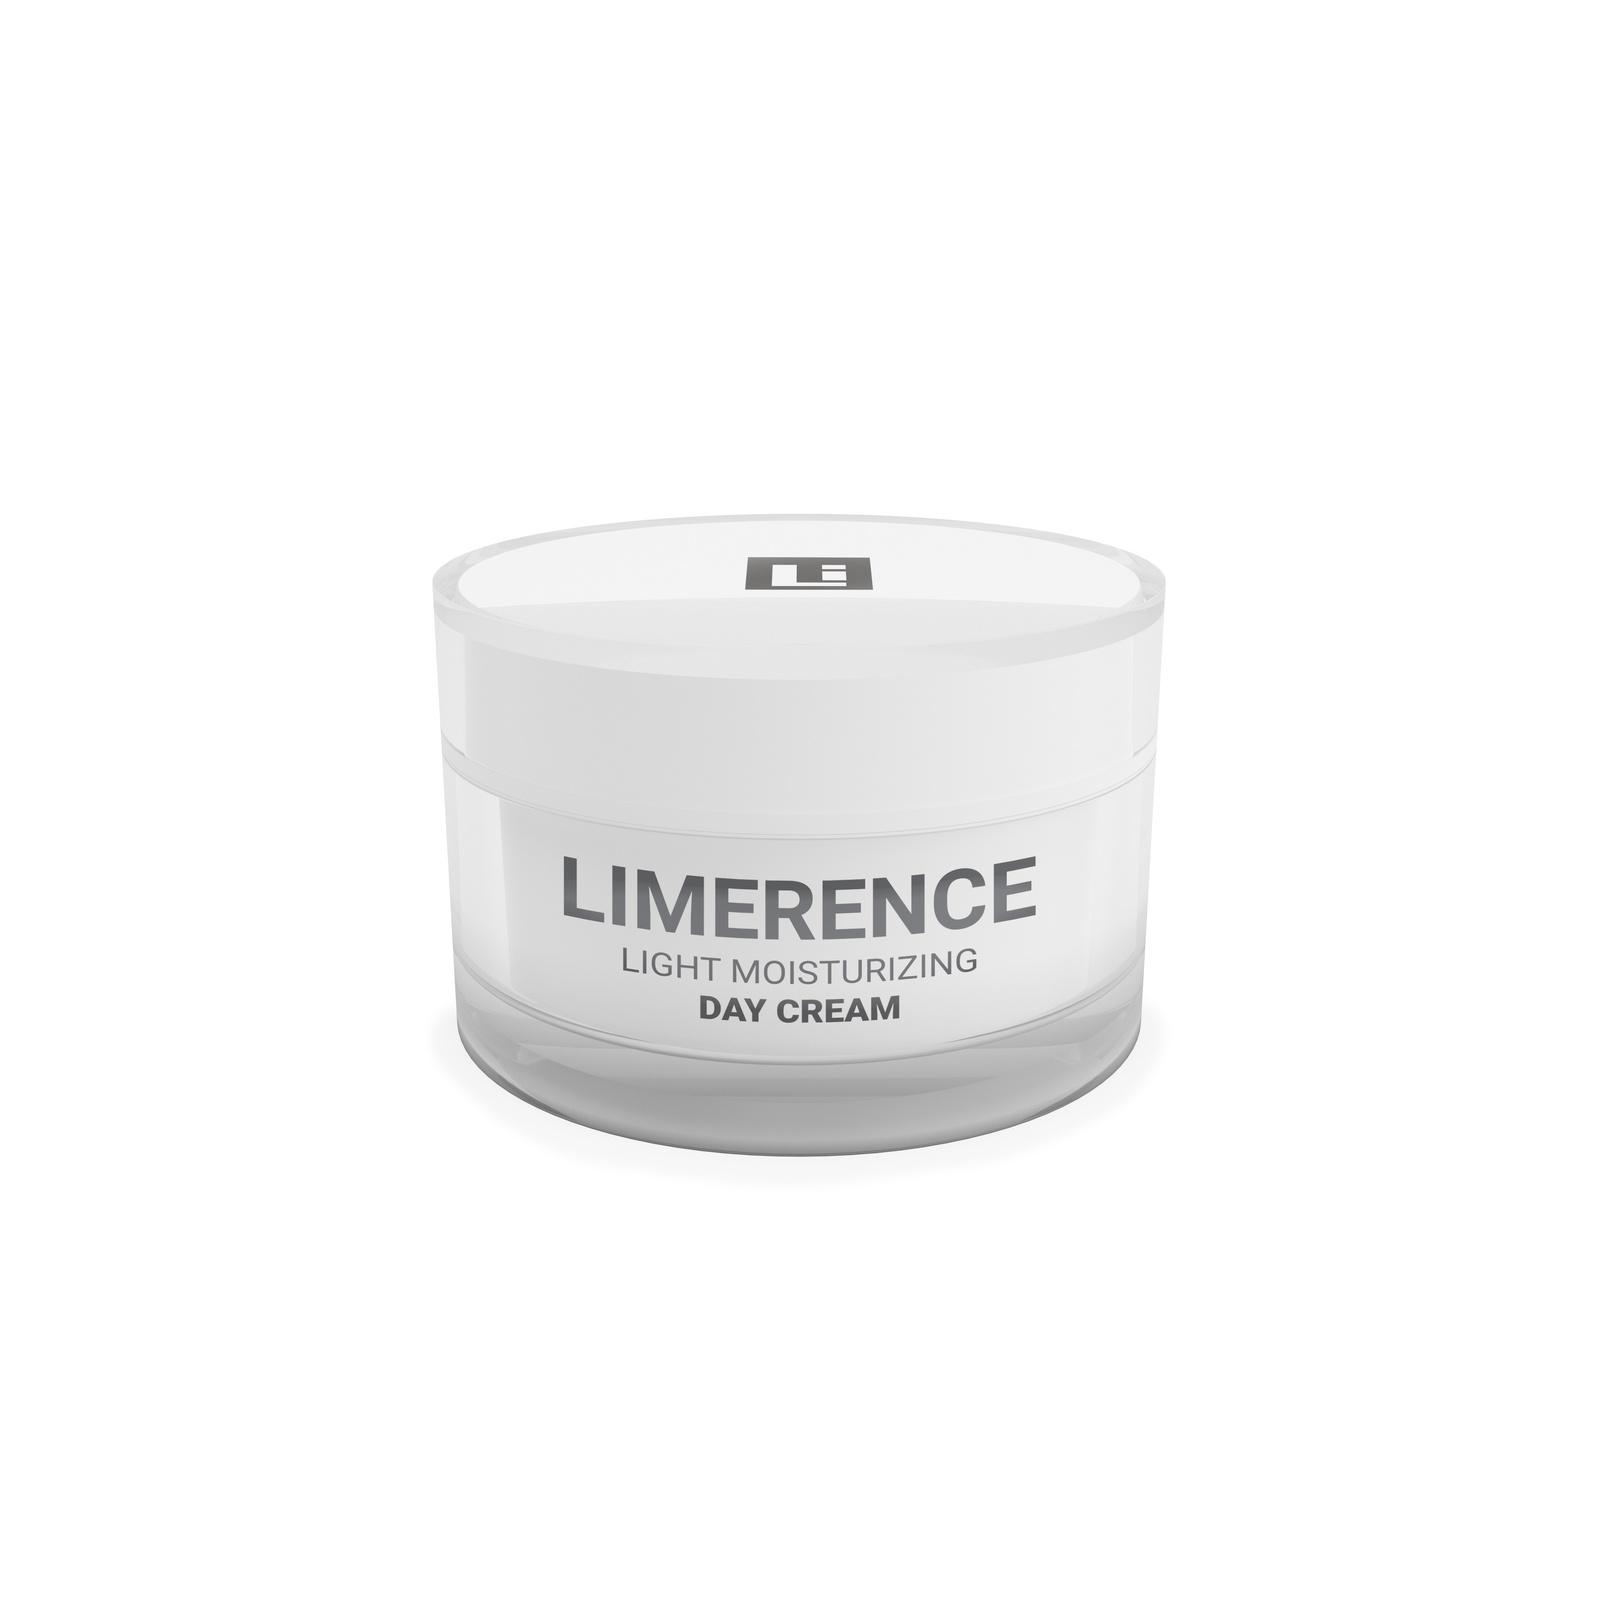 LimerenceУвлажняющий дневной крем Light Moisturizing Day Cream, 50 мл Limerence